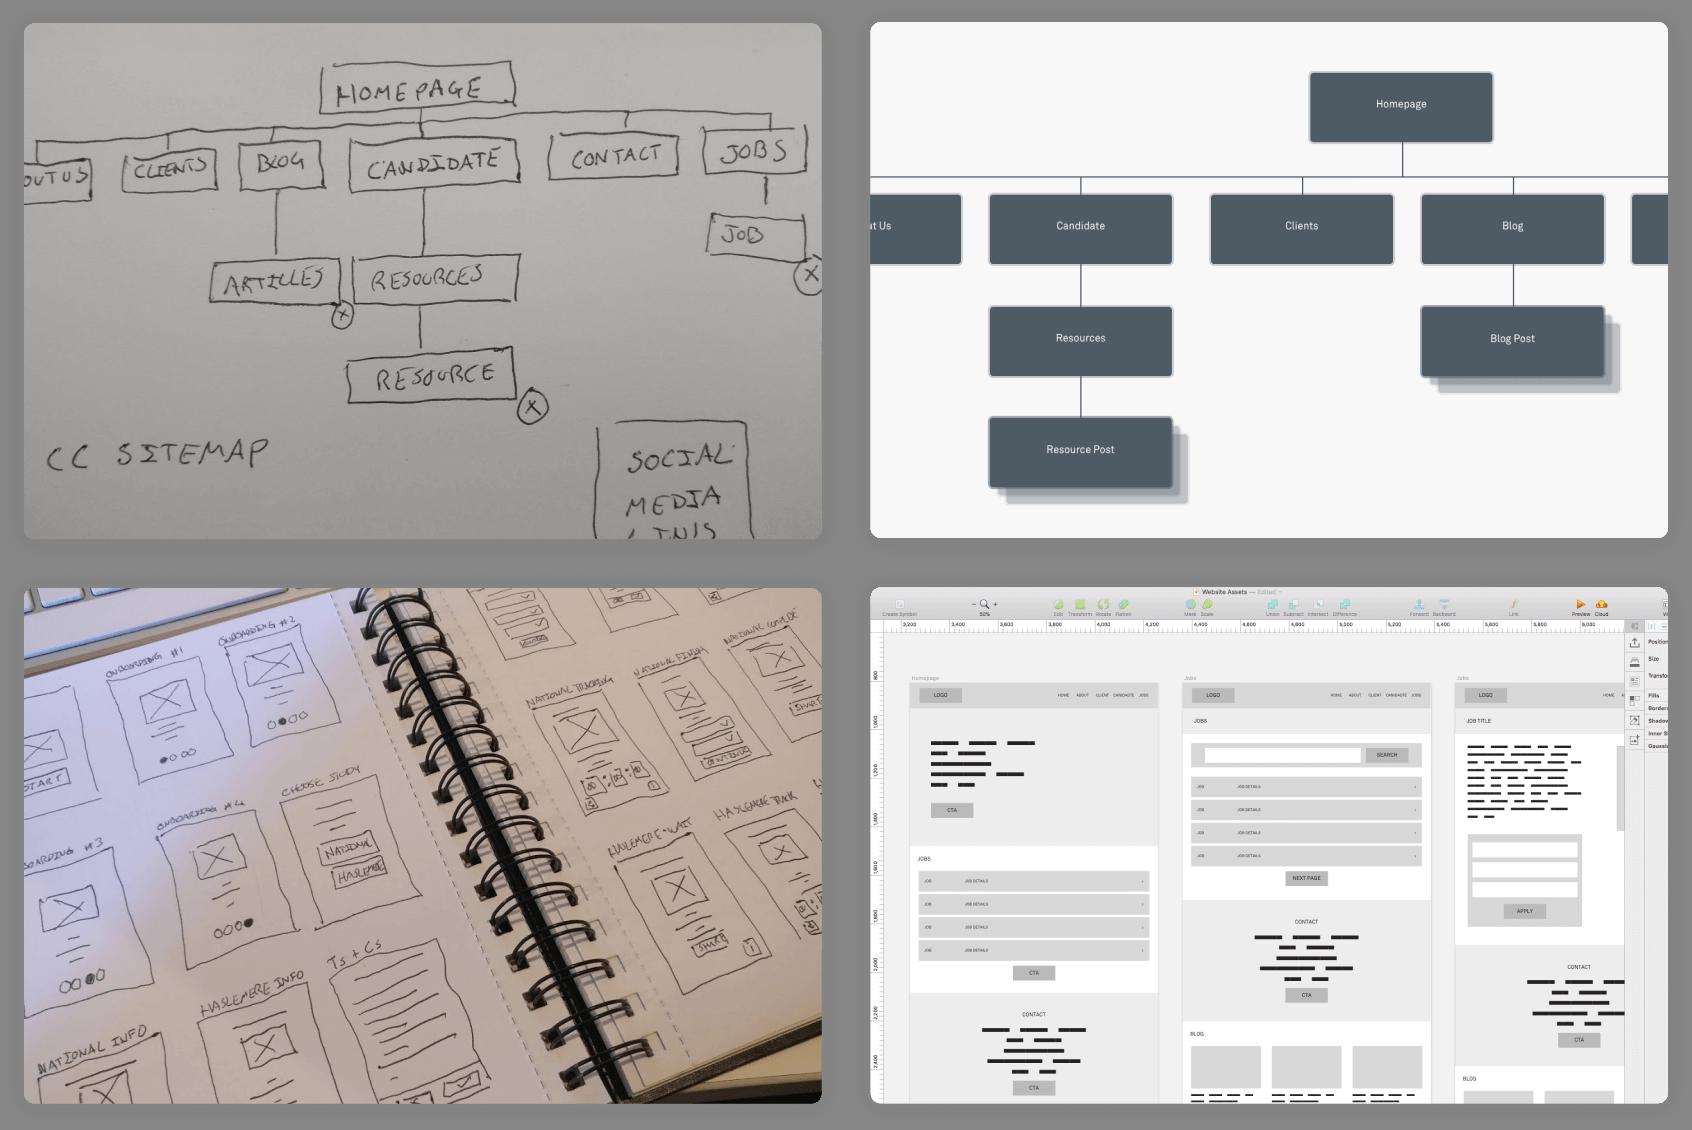 Continuous Solutions - Information architecture design process